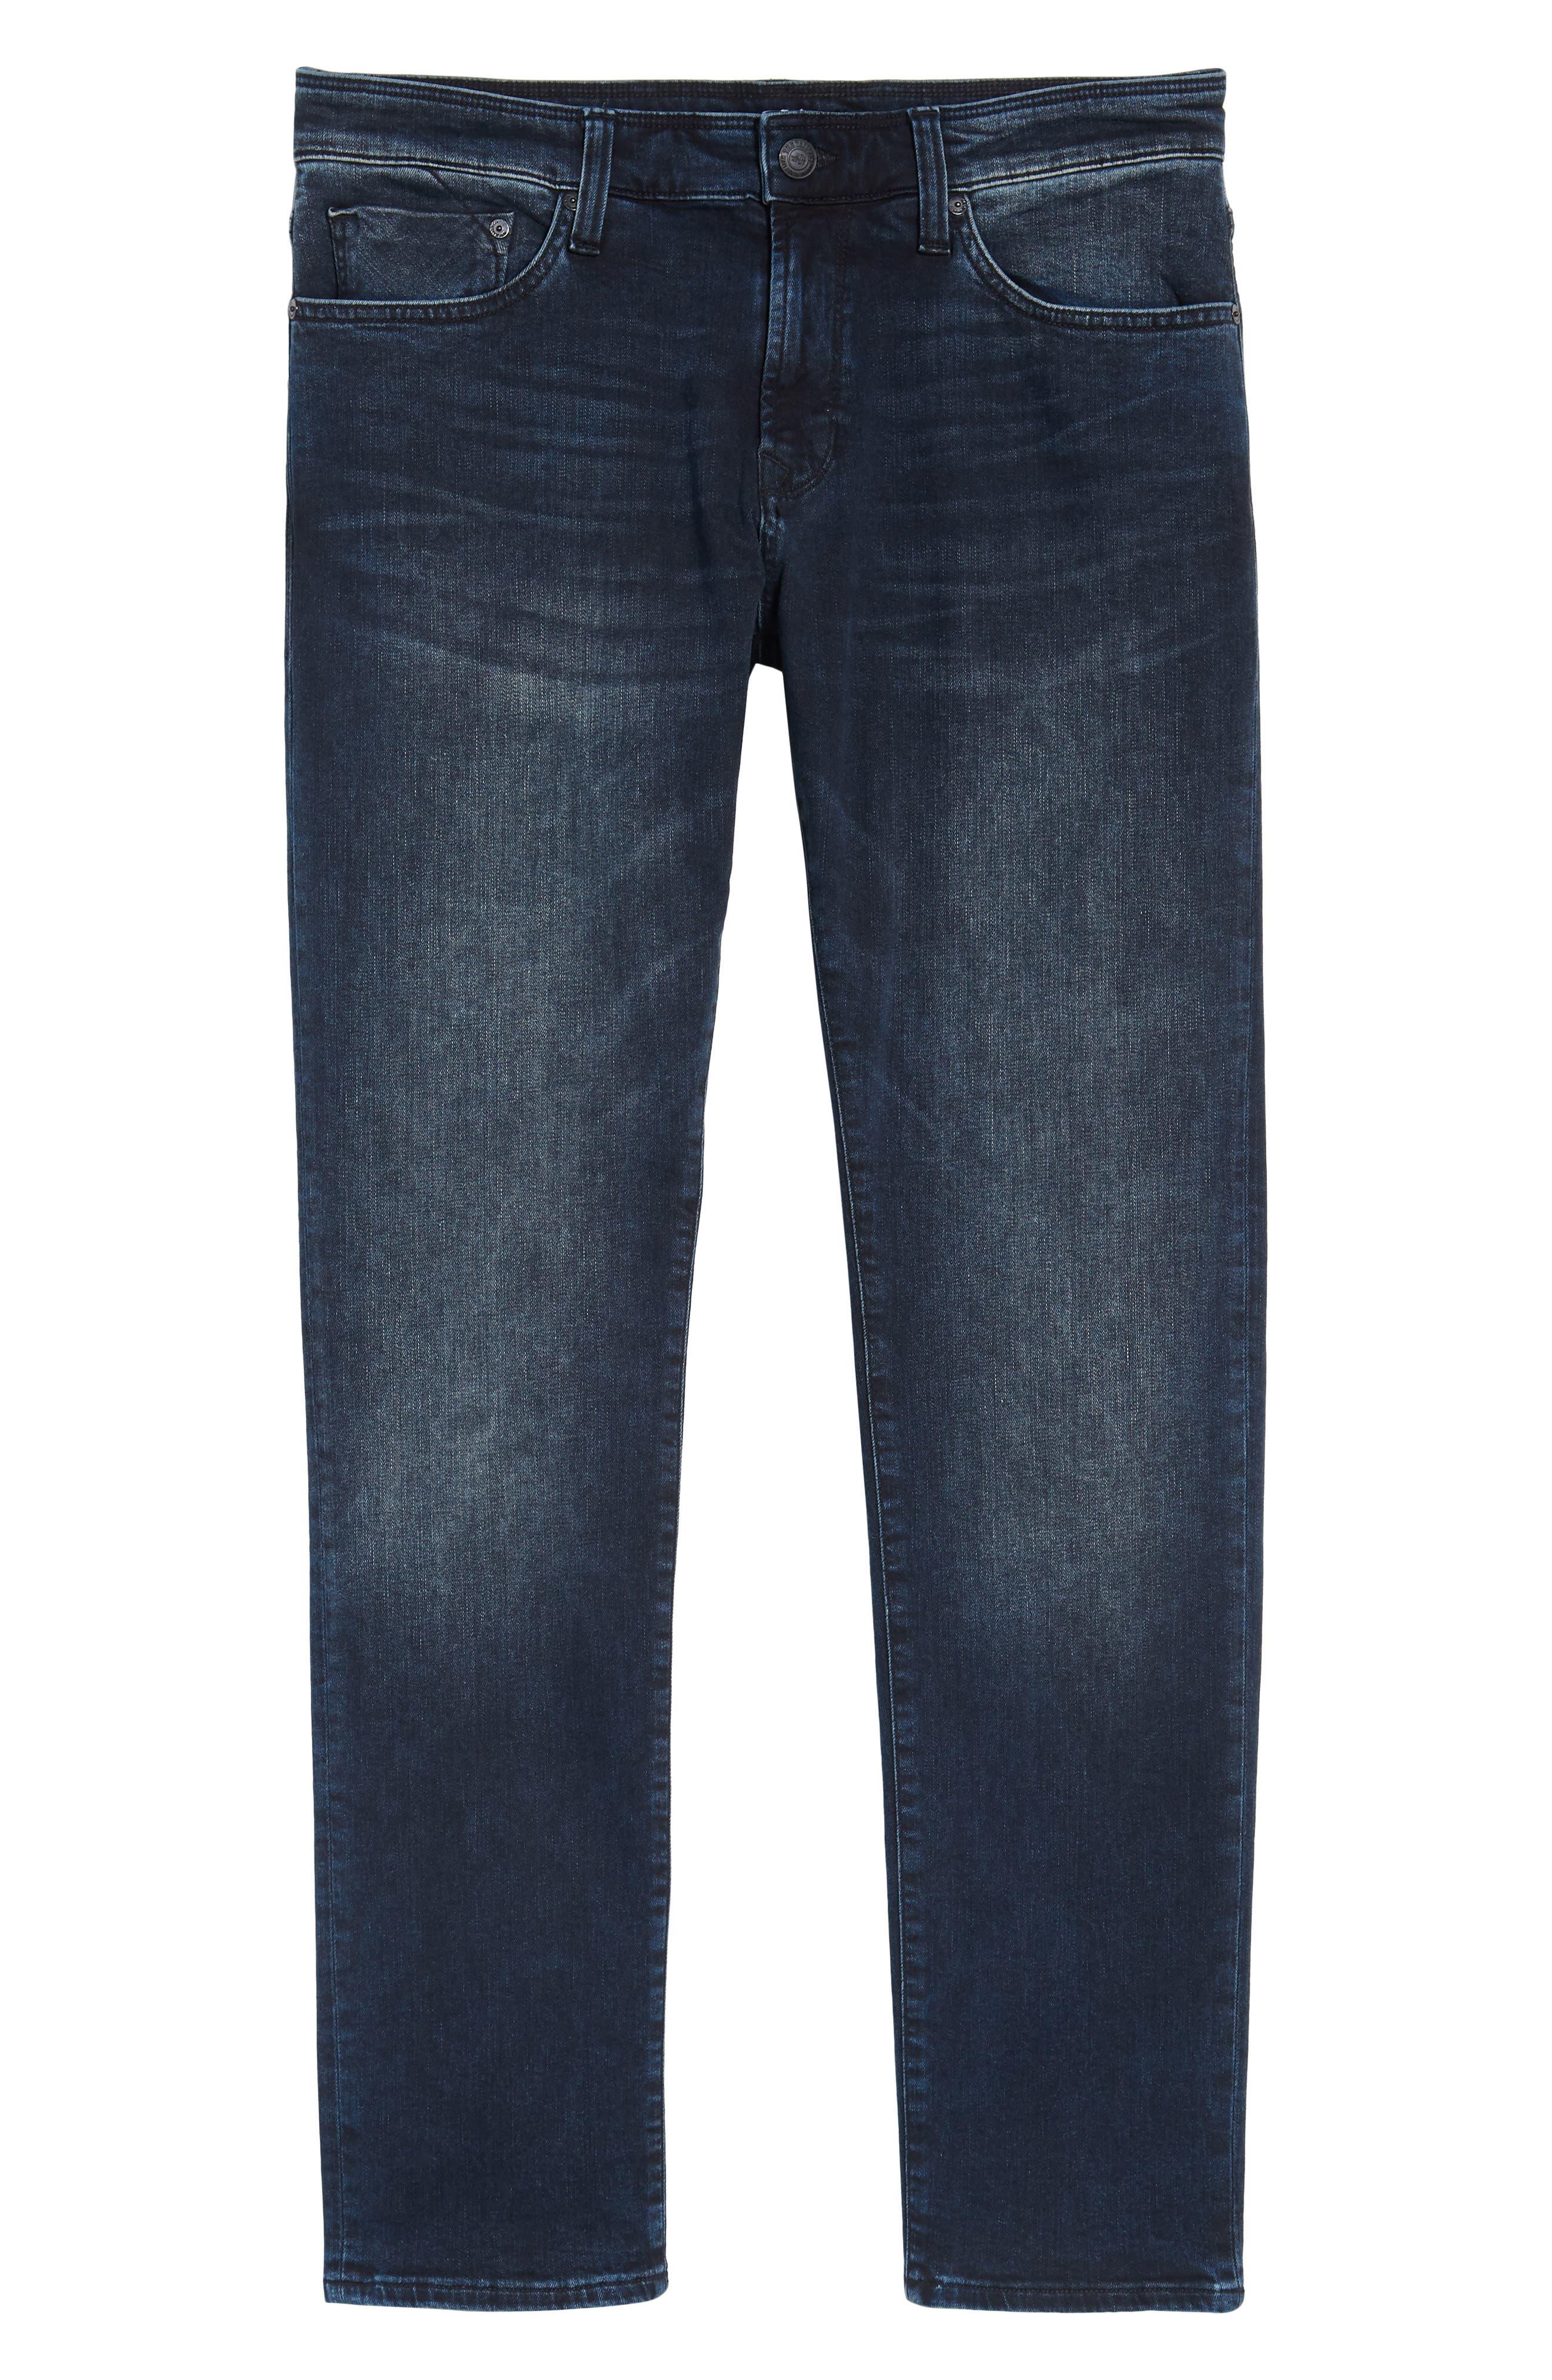 Jake Slim Fit Jeans,                             Alternate thumbnail 6, color,                             401